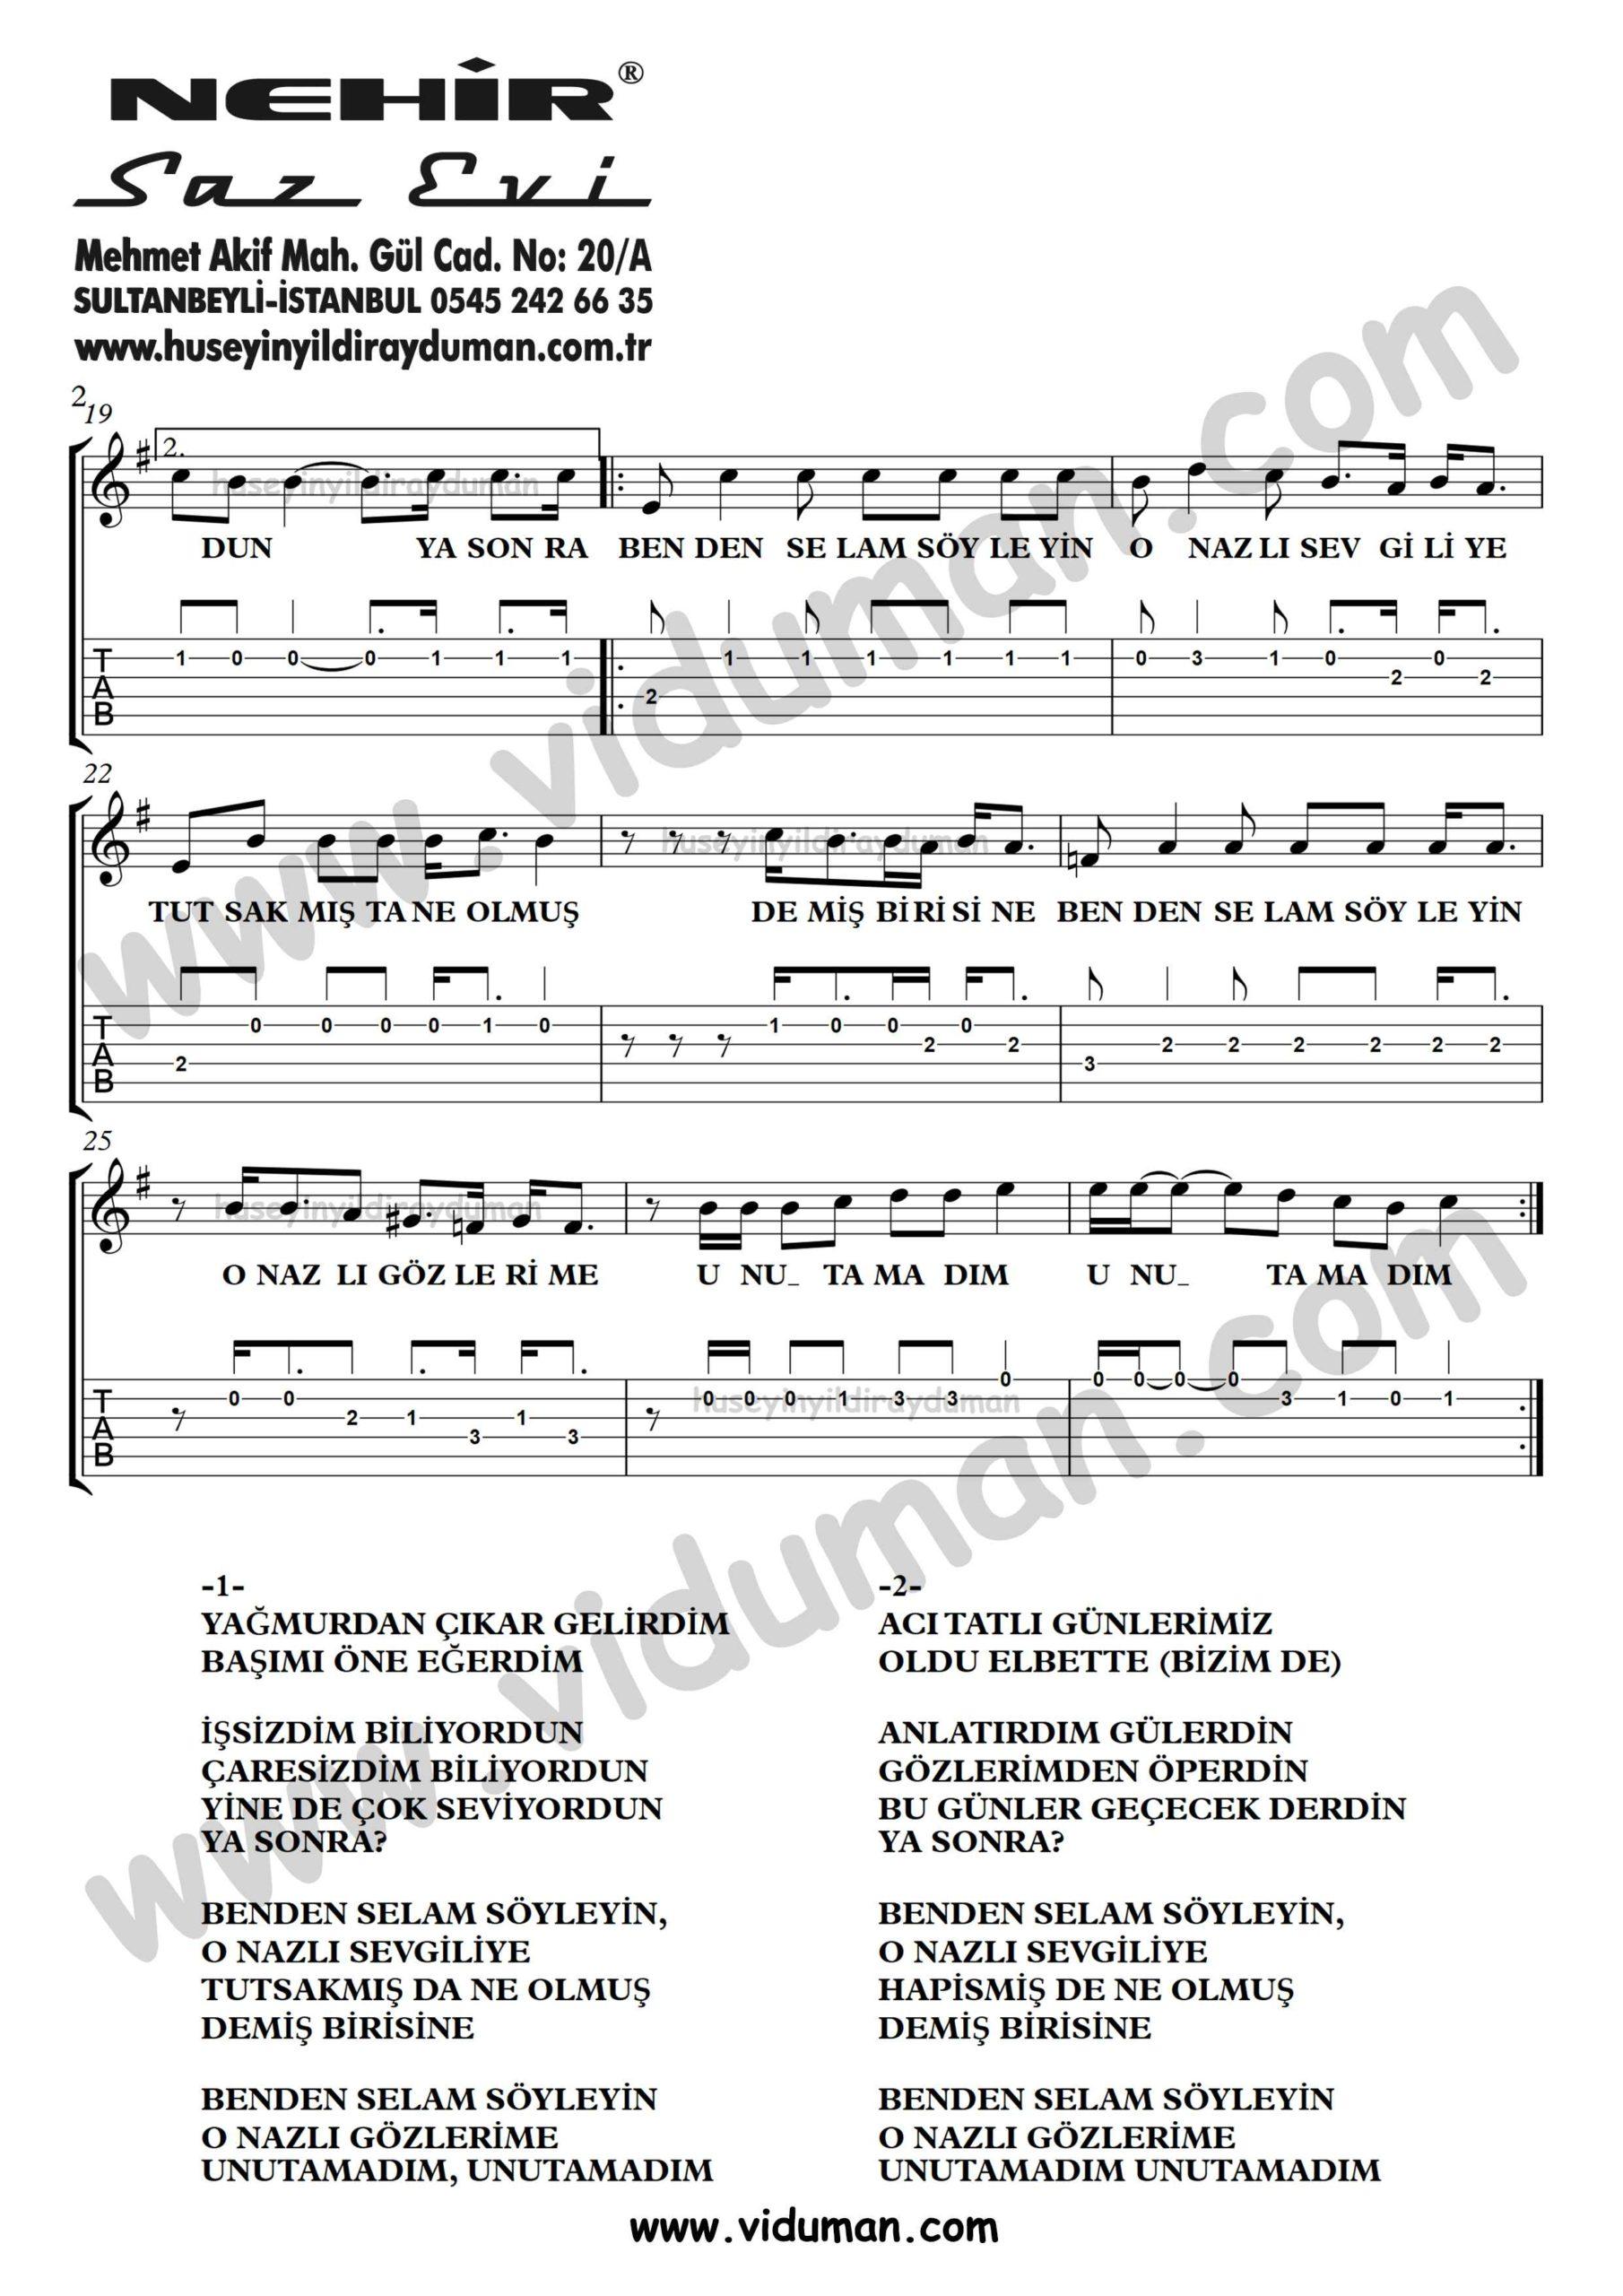 Benden Selam Soyleyin_2-Ahmet Kaya-Gitar Tab-Solo Notalari